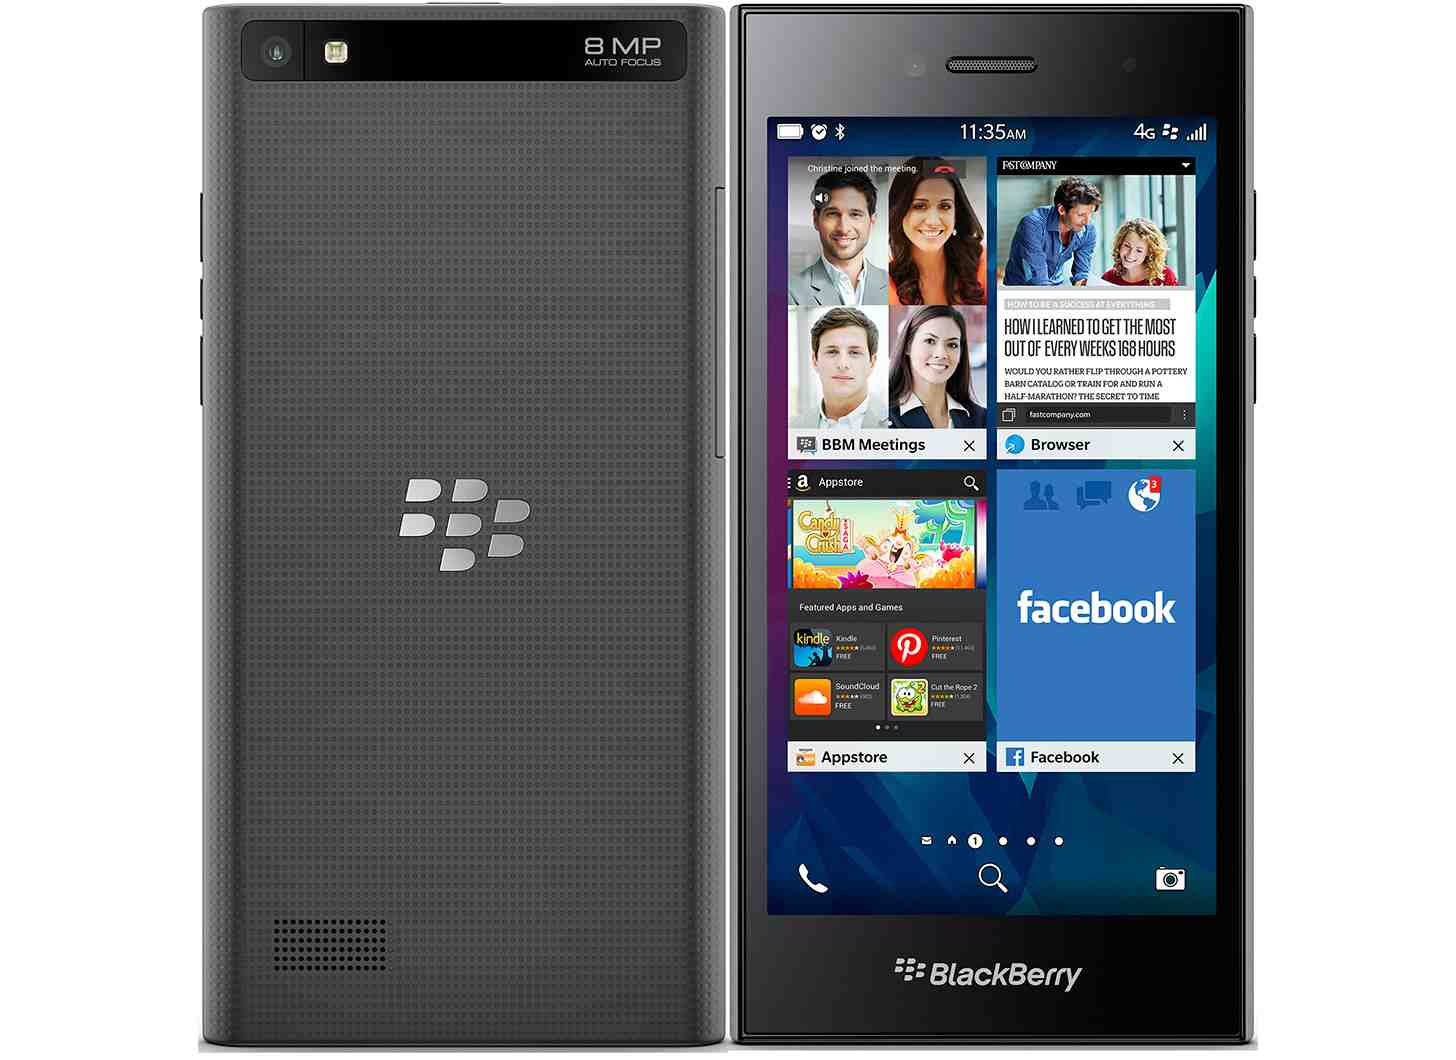 The-BlackBerry-Leap مراجعة BlackBerry Leap: ليس سيئا بالنظر إلى بطاريته